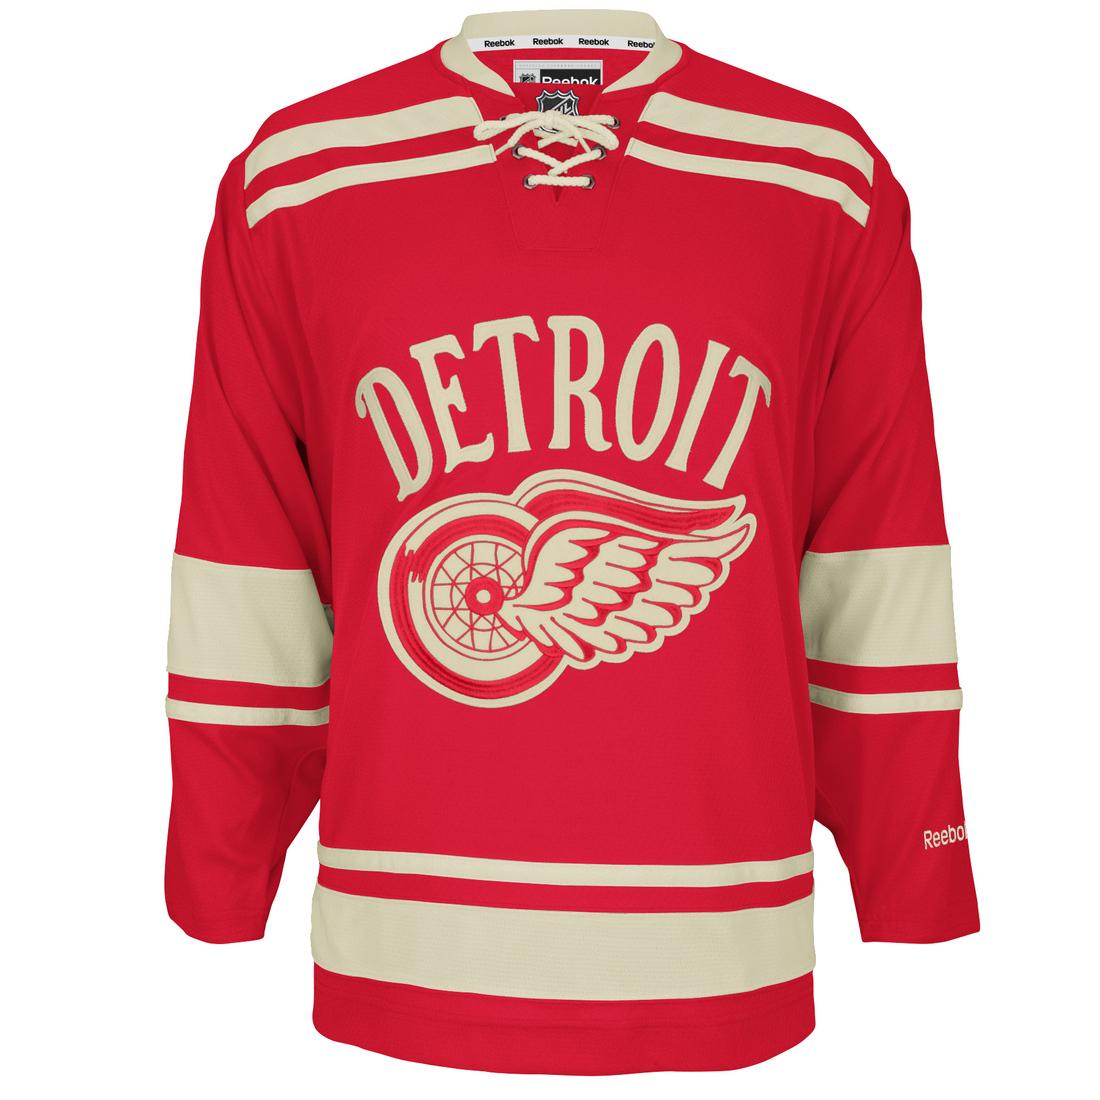 Red wings 2014 bridgestone nhl winter classic jersey front medium 2a830ce9c